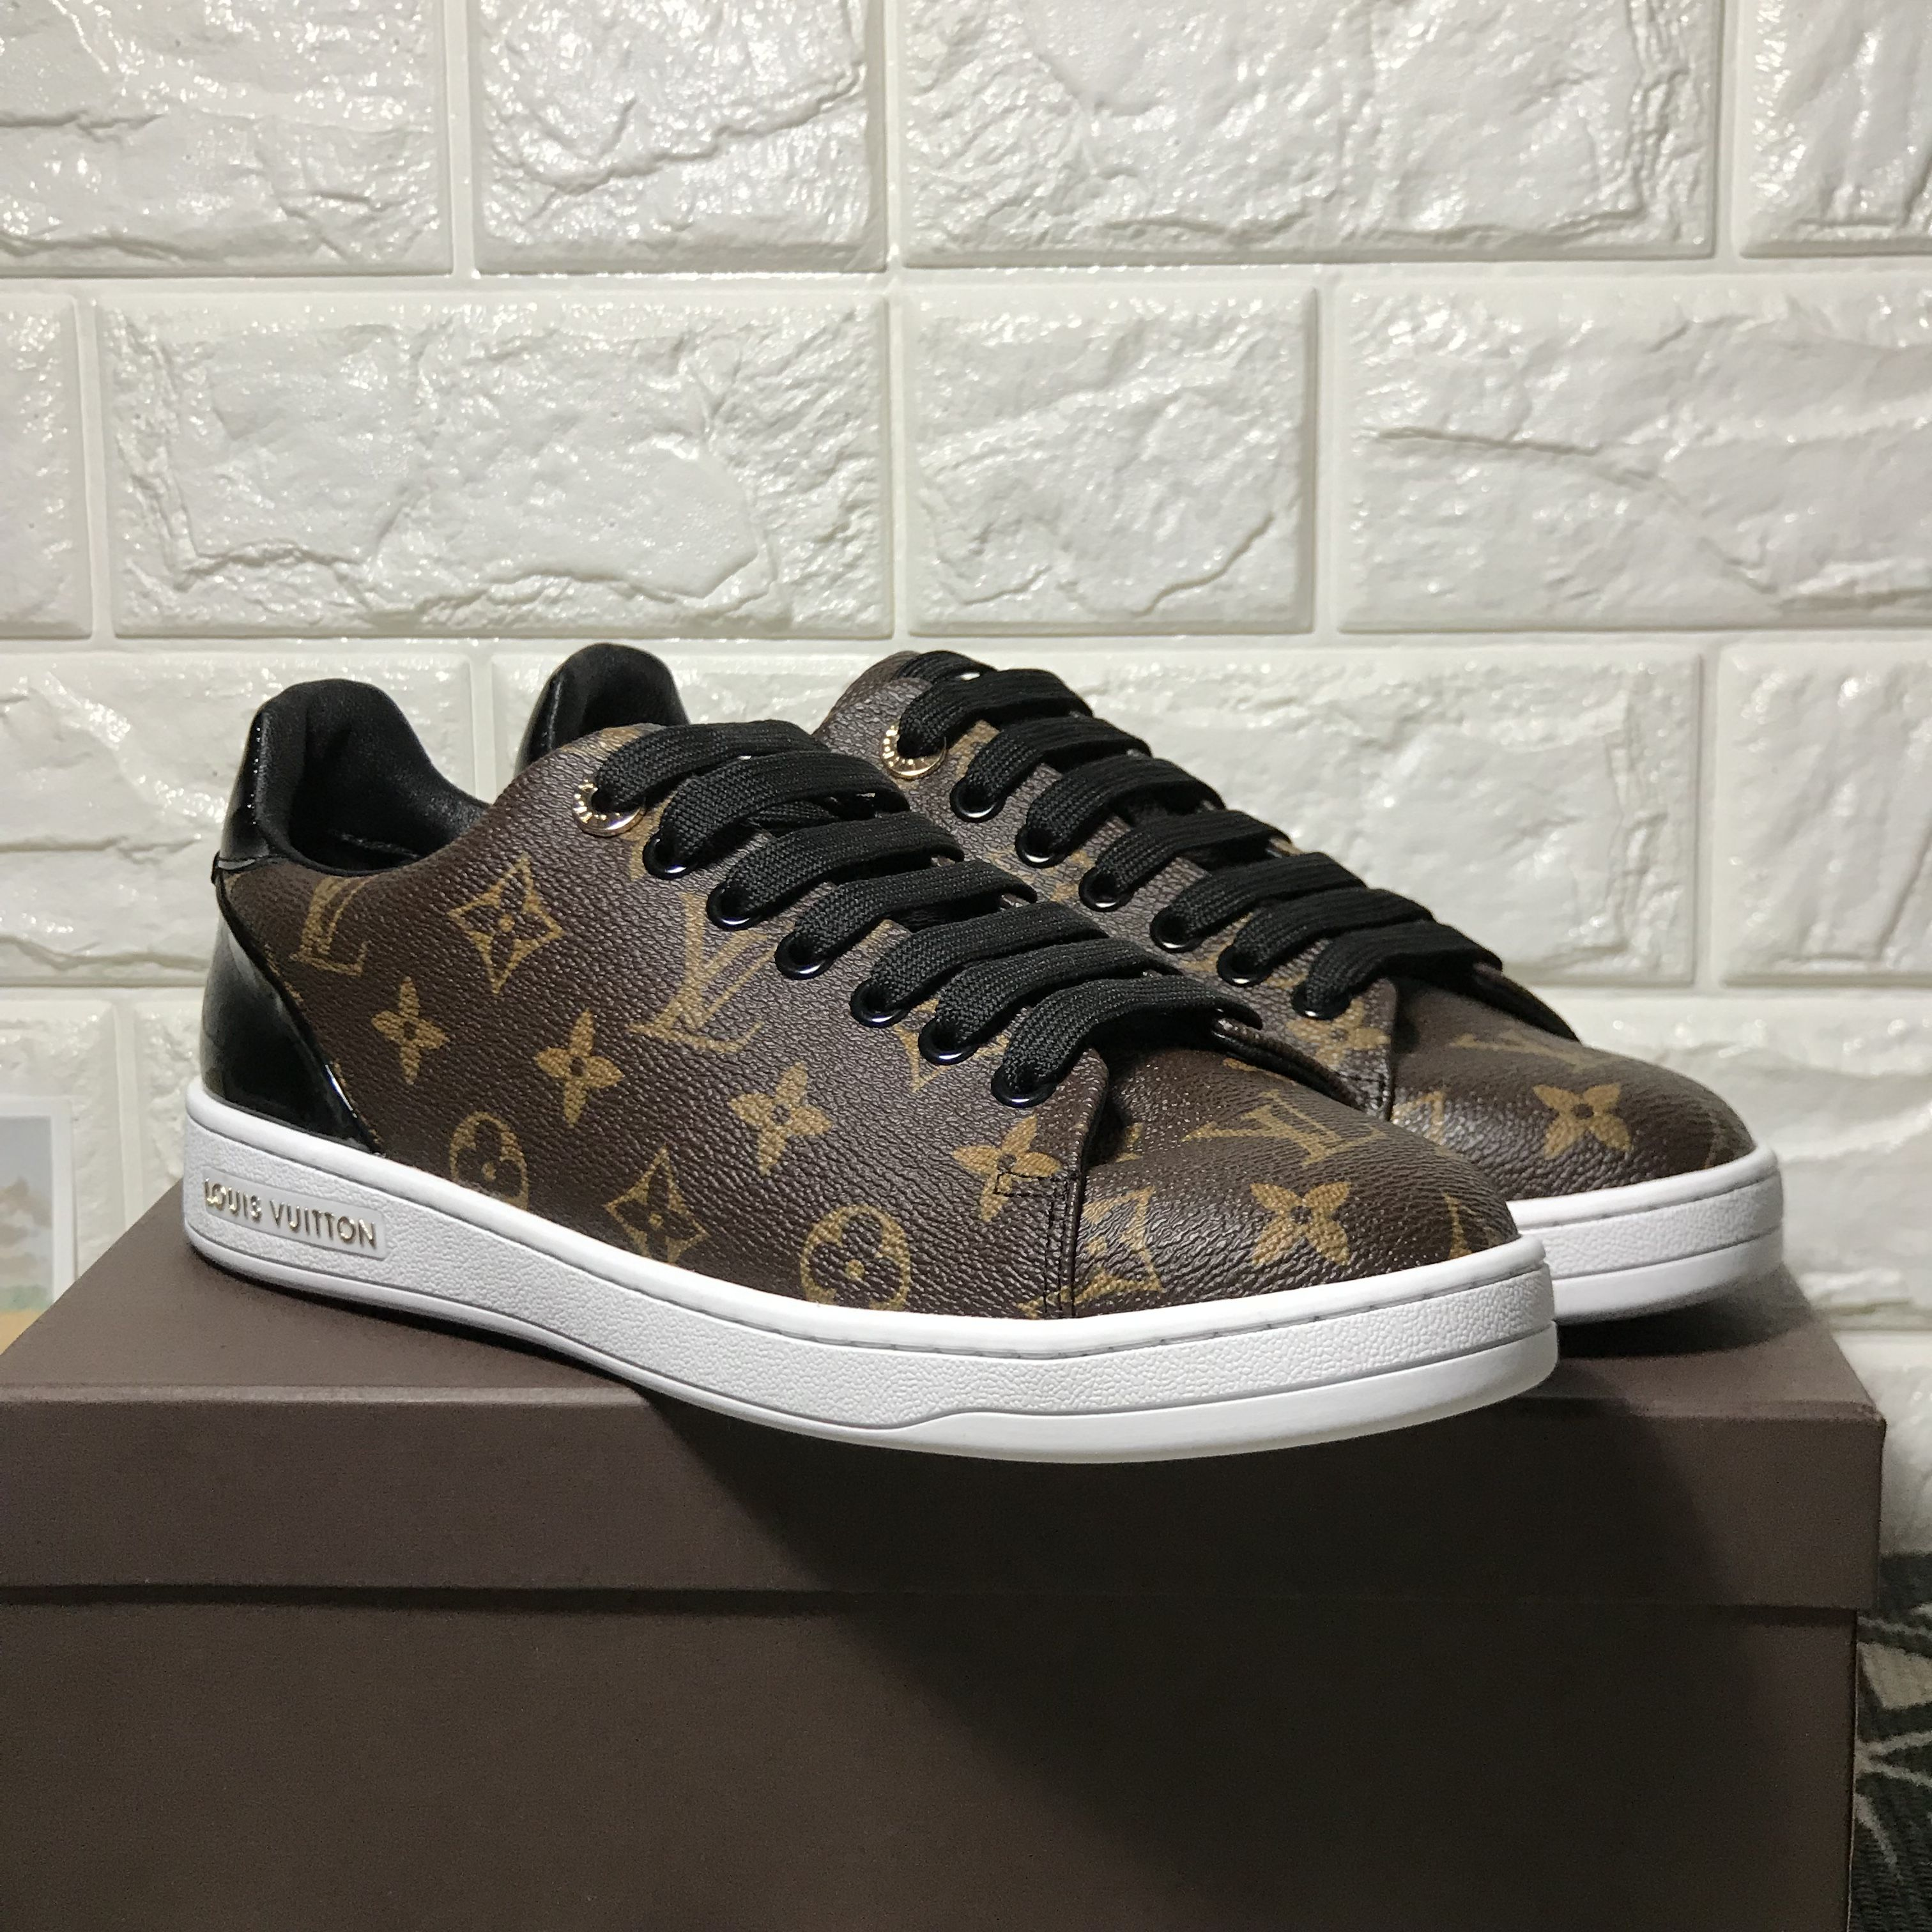 Louis vuitton sneakers low top